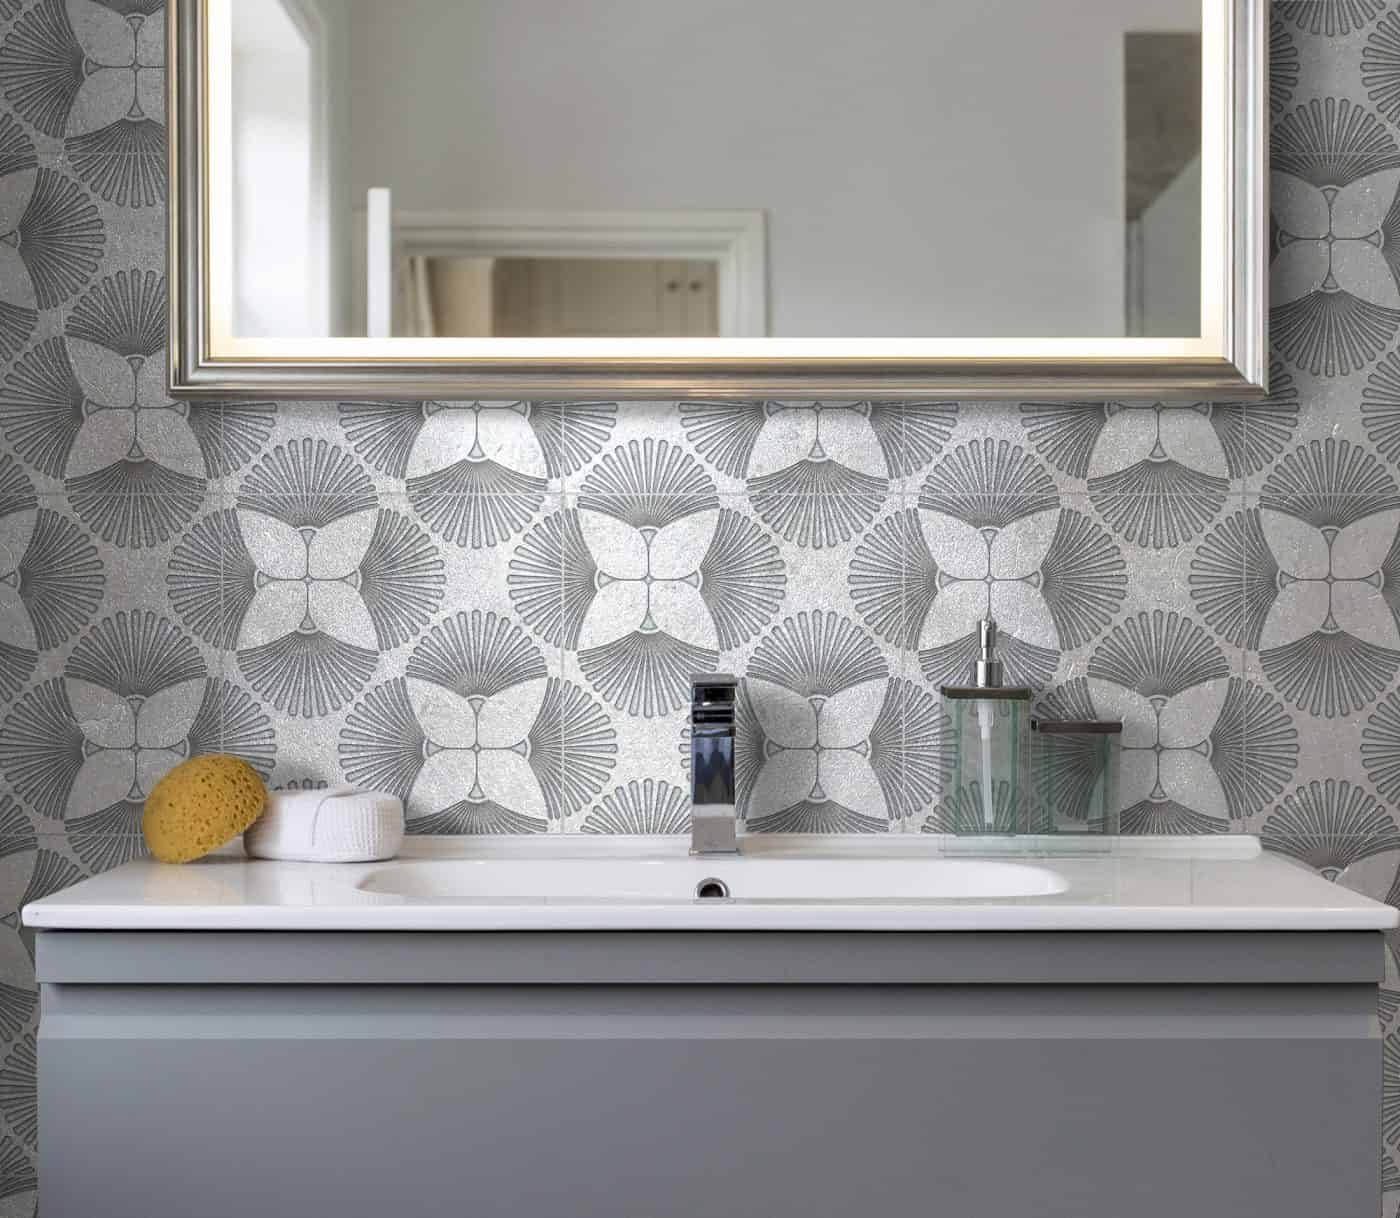 Decorative Bathroom Backsplash on Silver Luster Limestone tile featuring Briolette Pattern in Agate